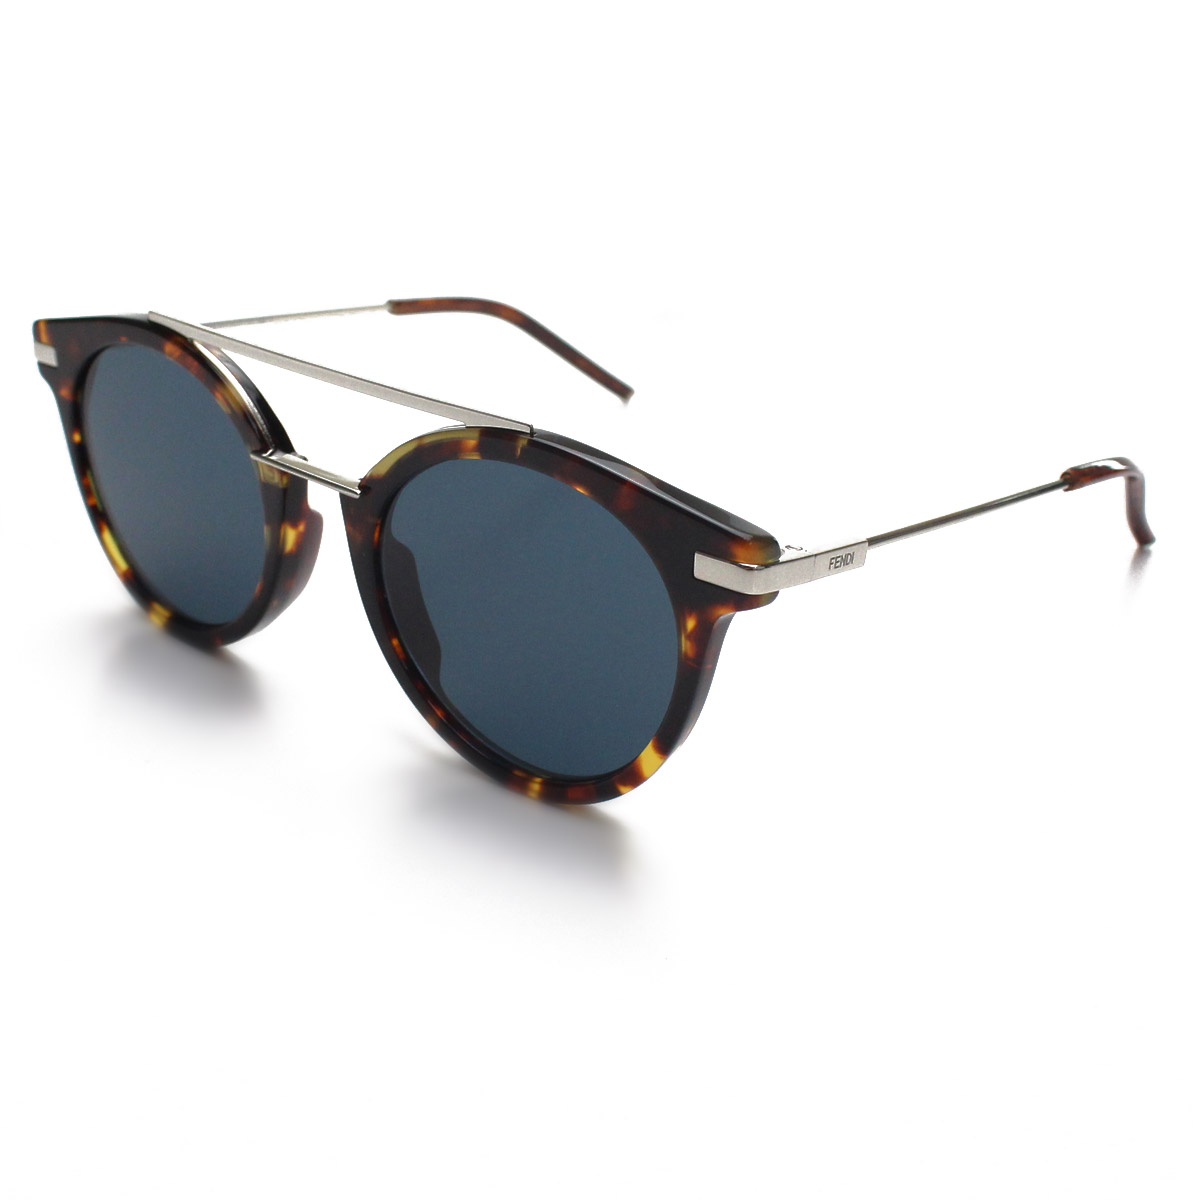 abbd3f2538bd Fendi FENDI round tortoiseshell pattern brown Demi sunglasses 0225 9GO/KU  brown system